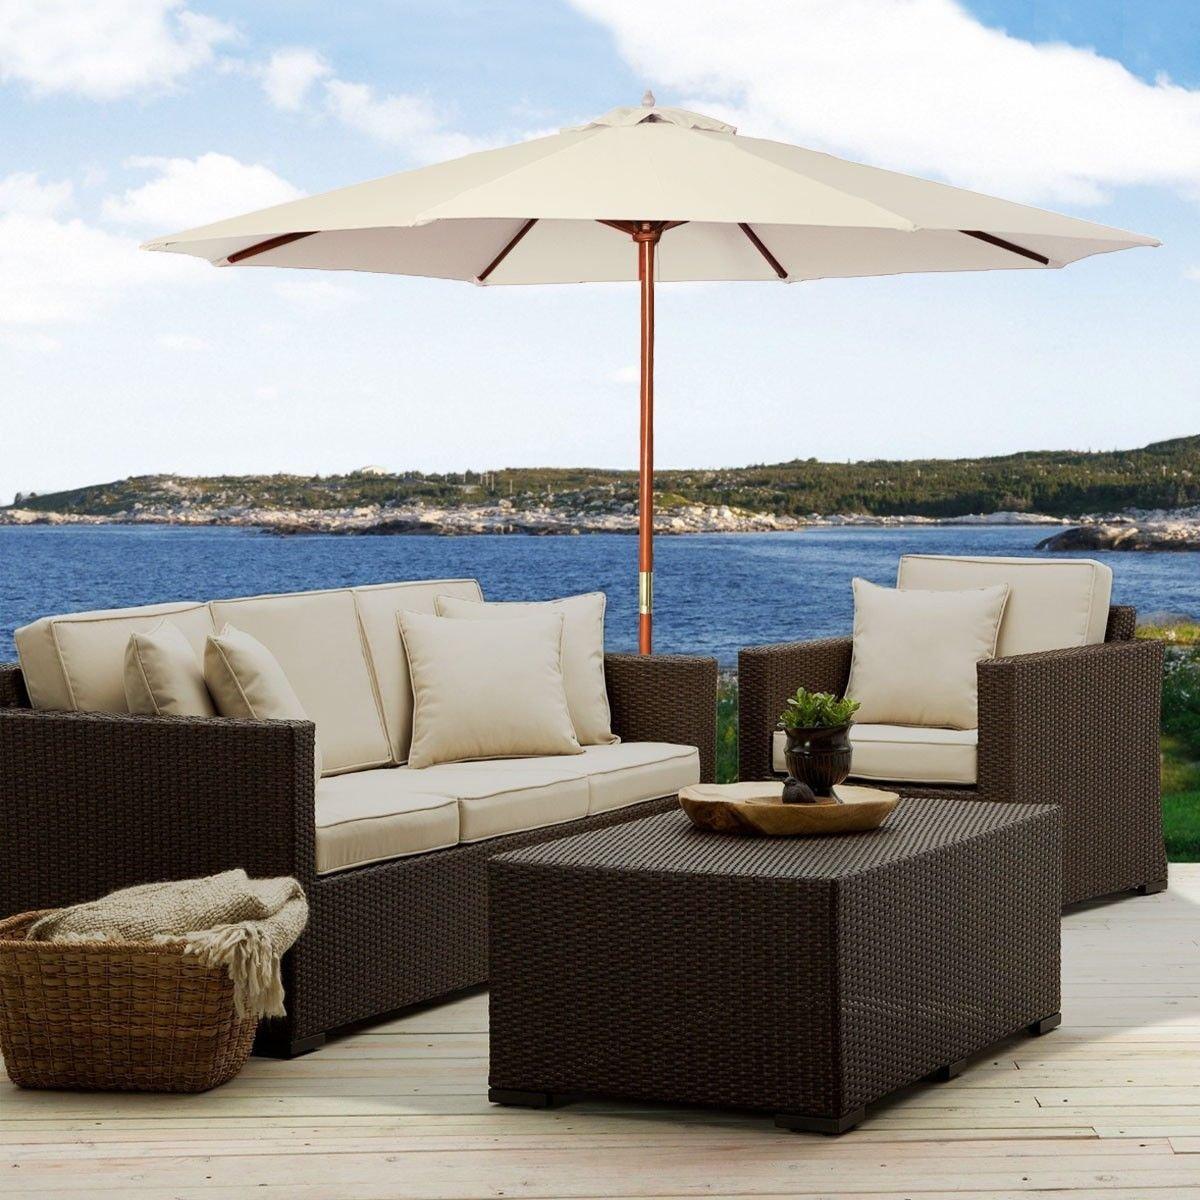 Amazon.com : 10Ft Wooden Patio Umbrella Sun Shade Wood Pole Outdoor Beach  Cafe Garden Beige : Garden U0026 Outdoor